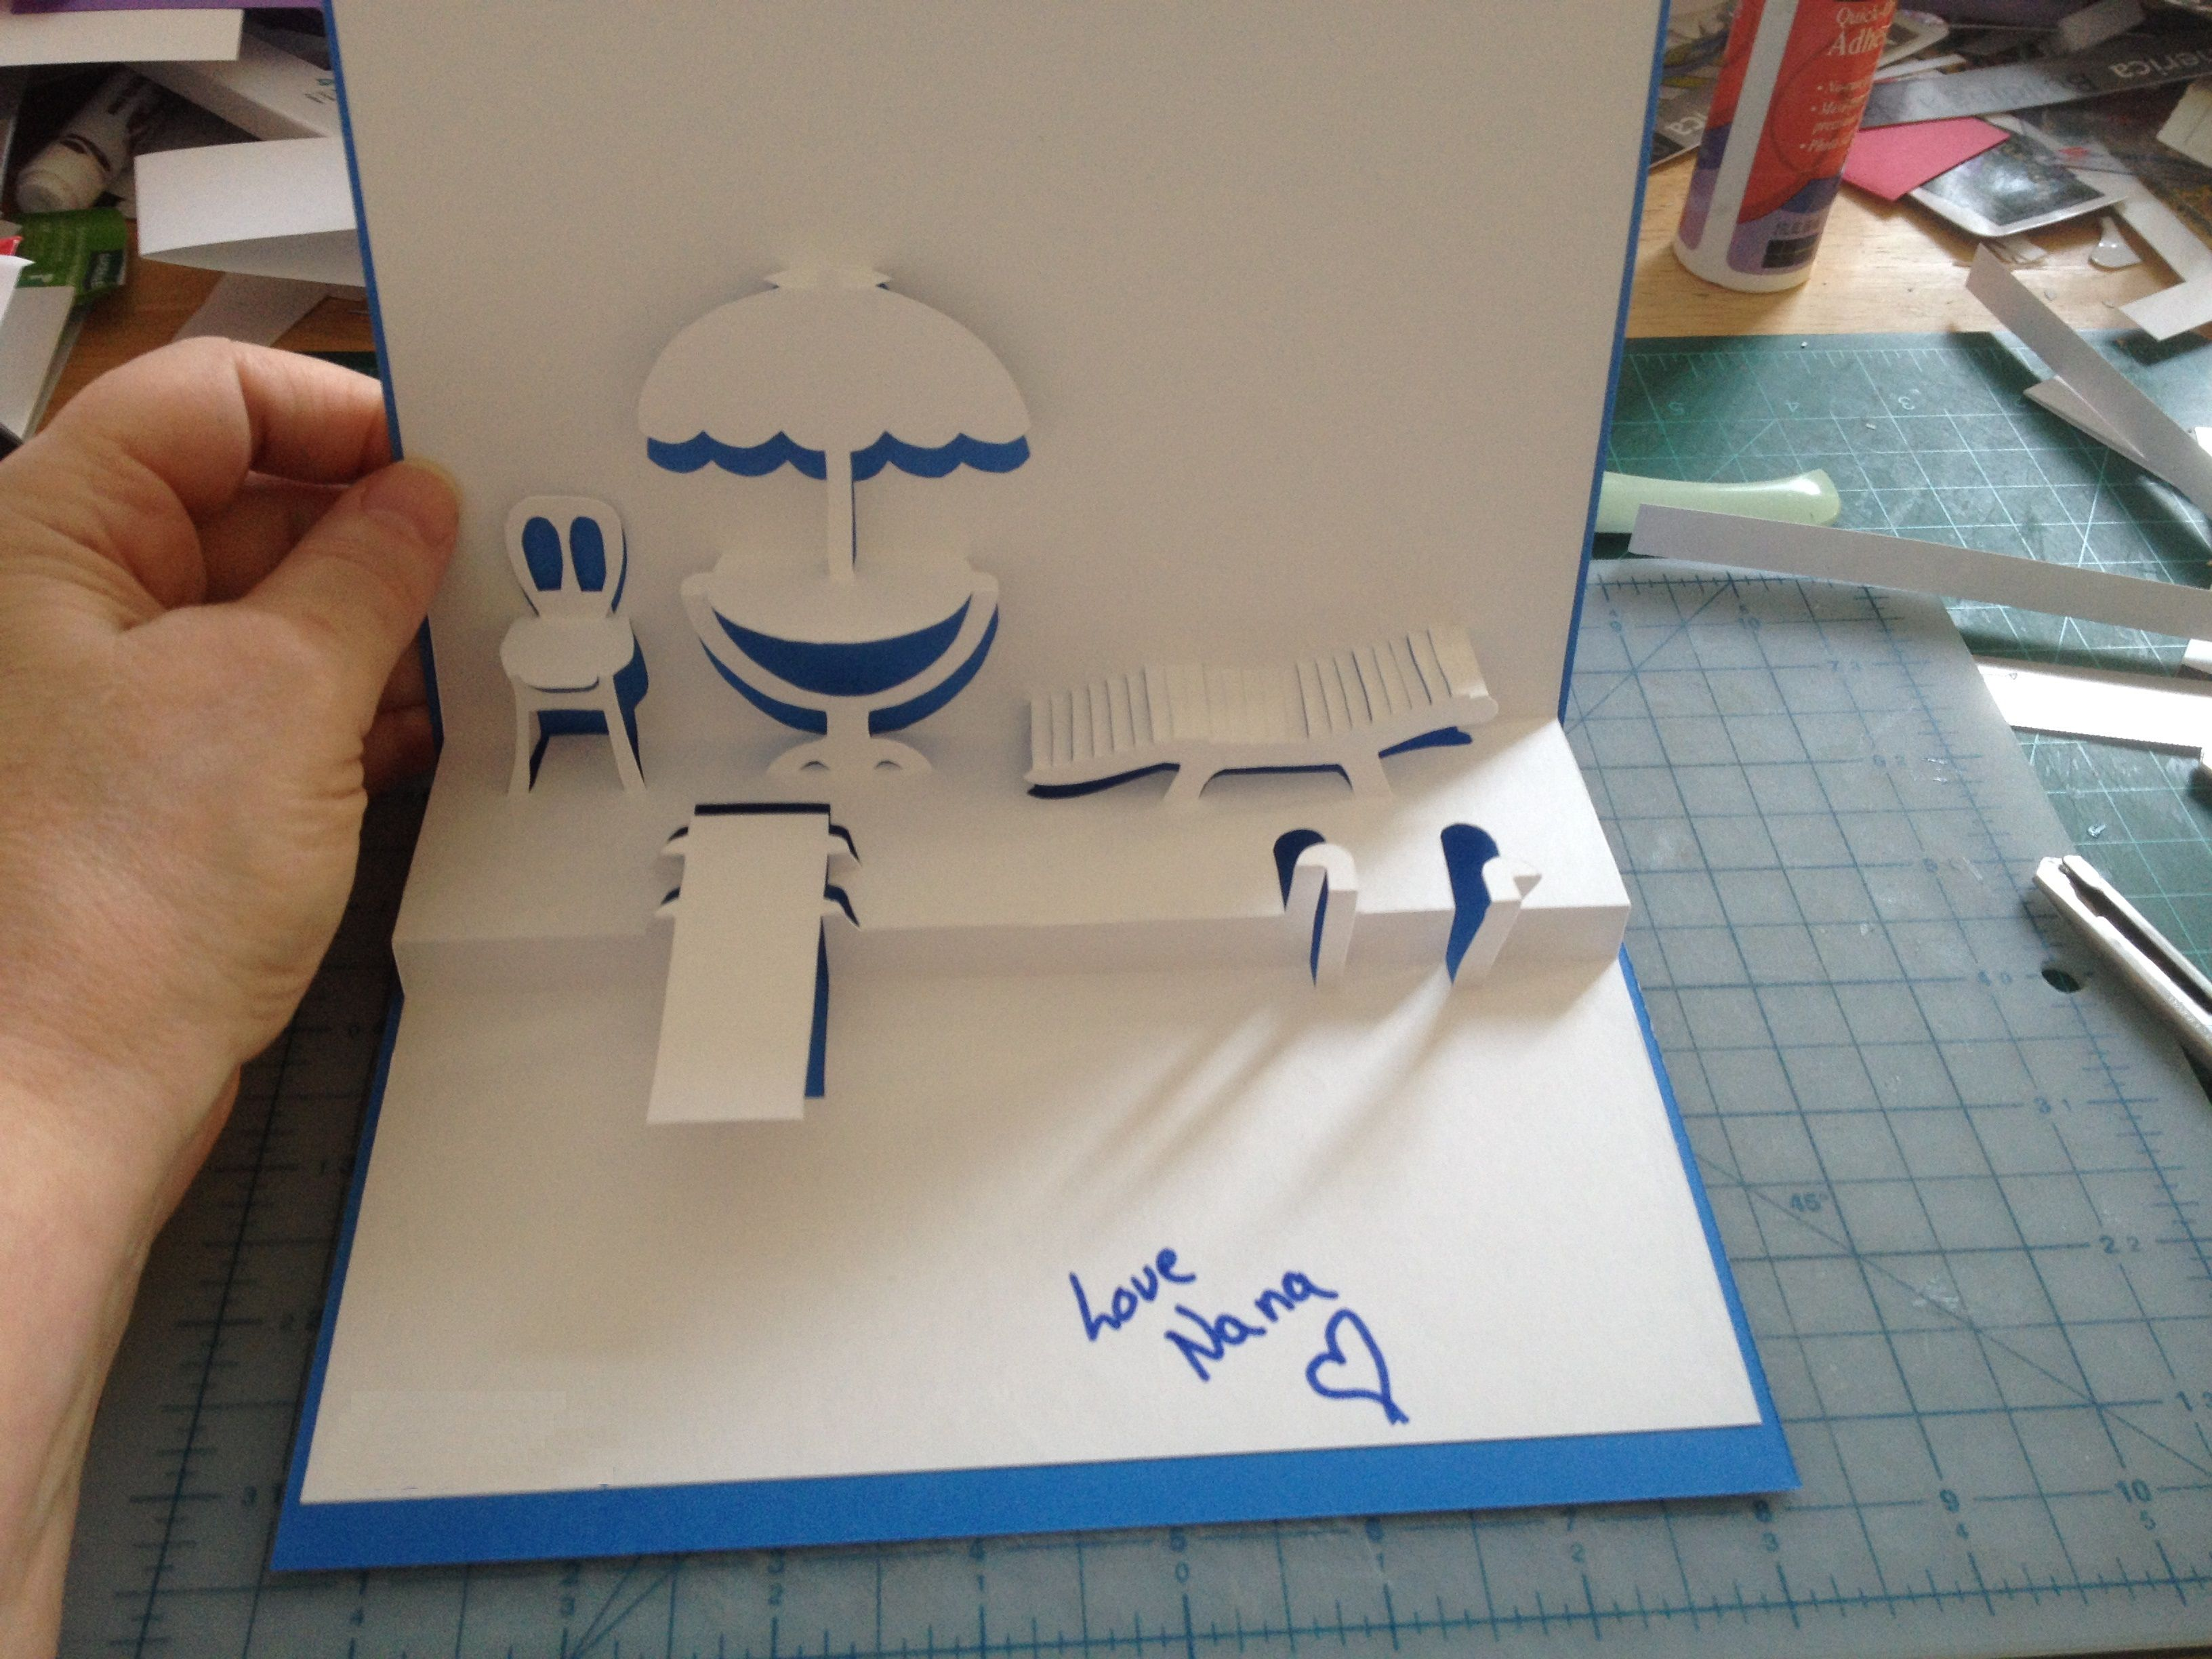 Swim Pool Pop Up Card Template From Cahier De Kirigami No 4 By Naomiki Sato Nana Cards